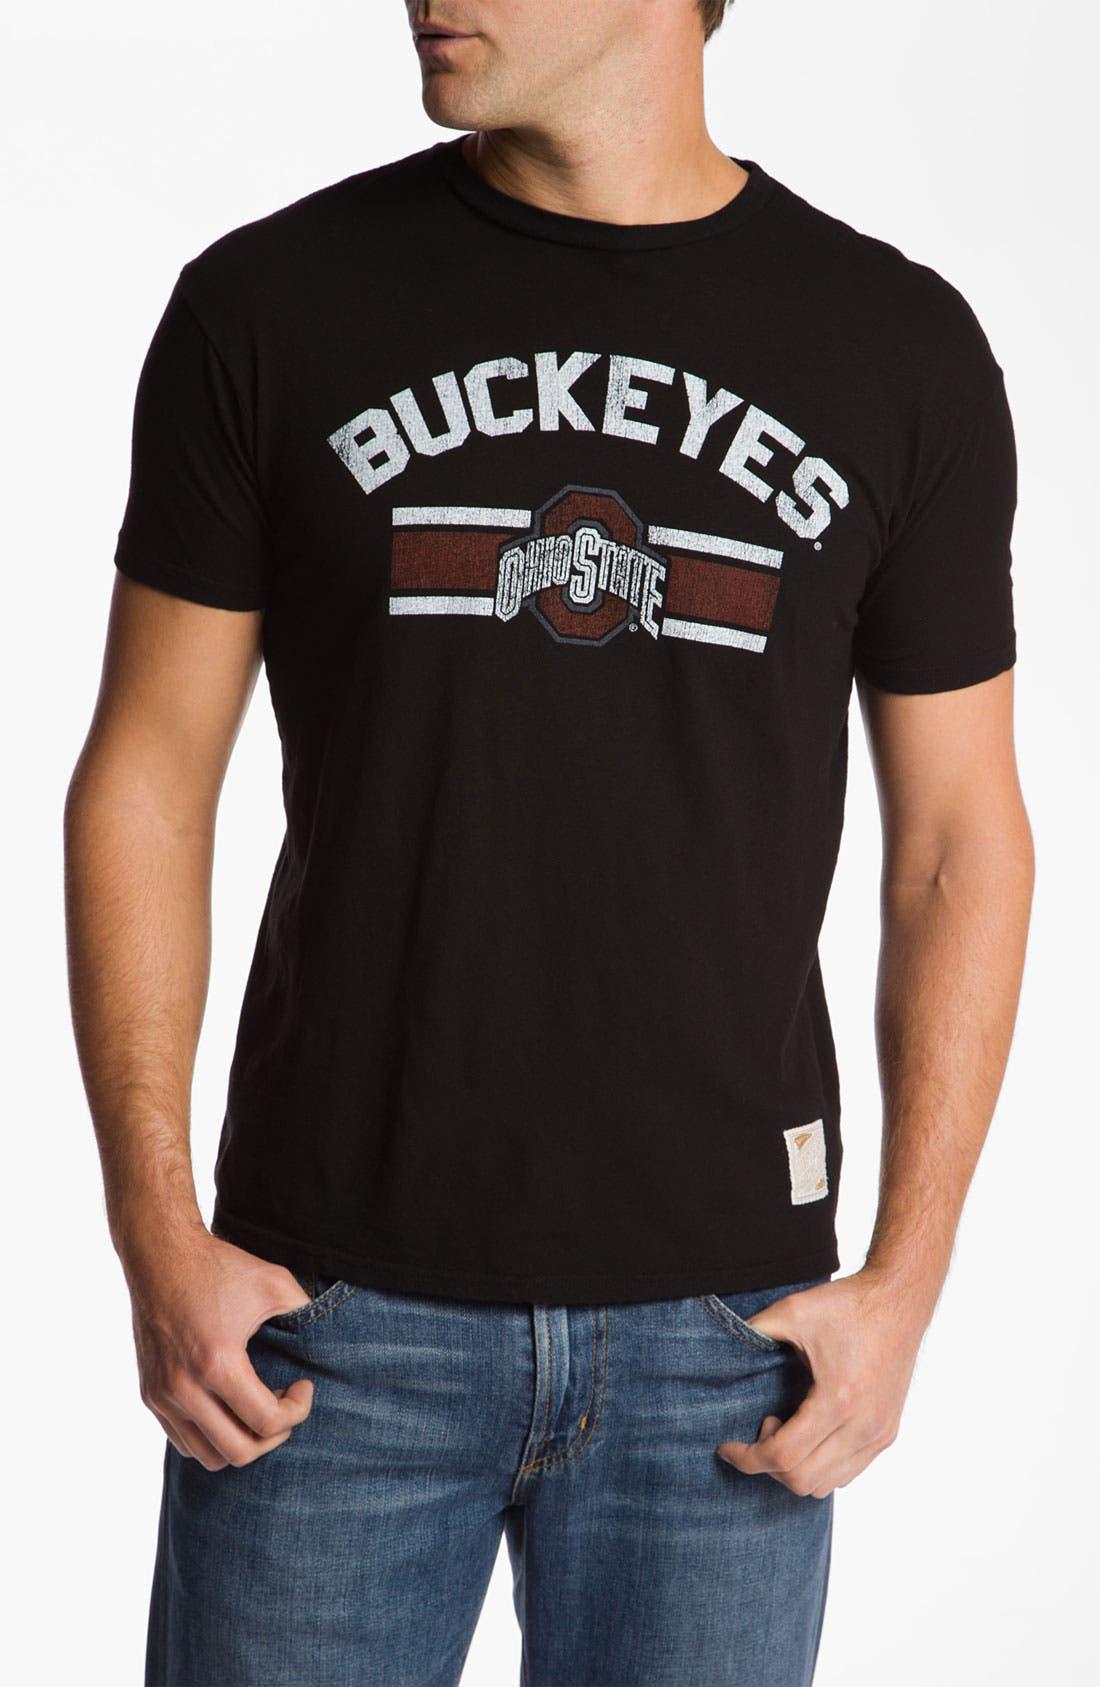 Alternate Image 1 Selected - The Original Retro Brand 'Ohio State Buckeyes' T-Shirt